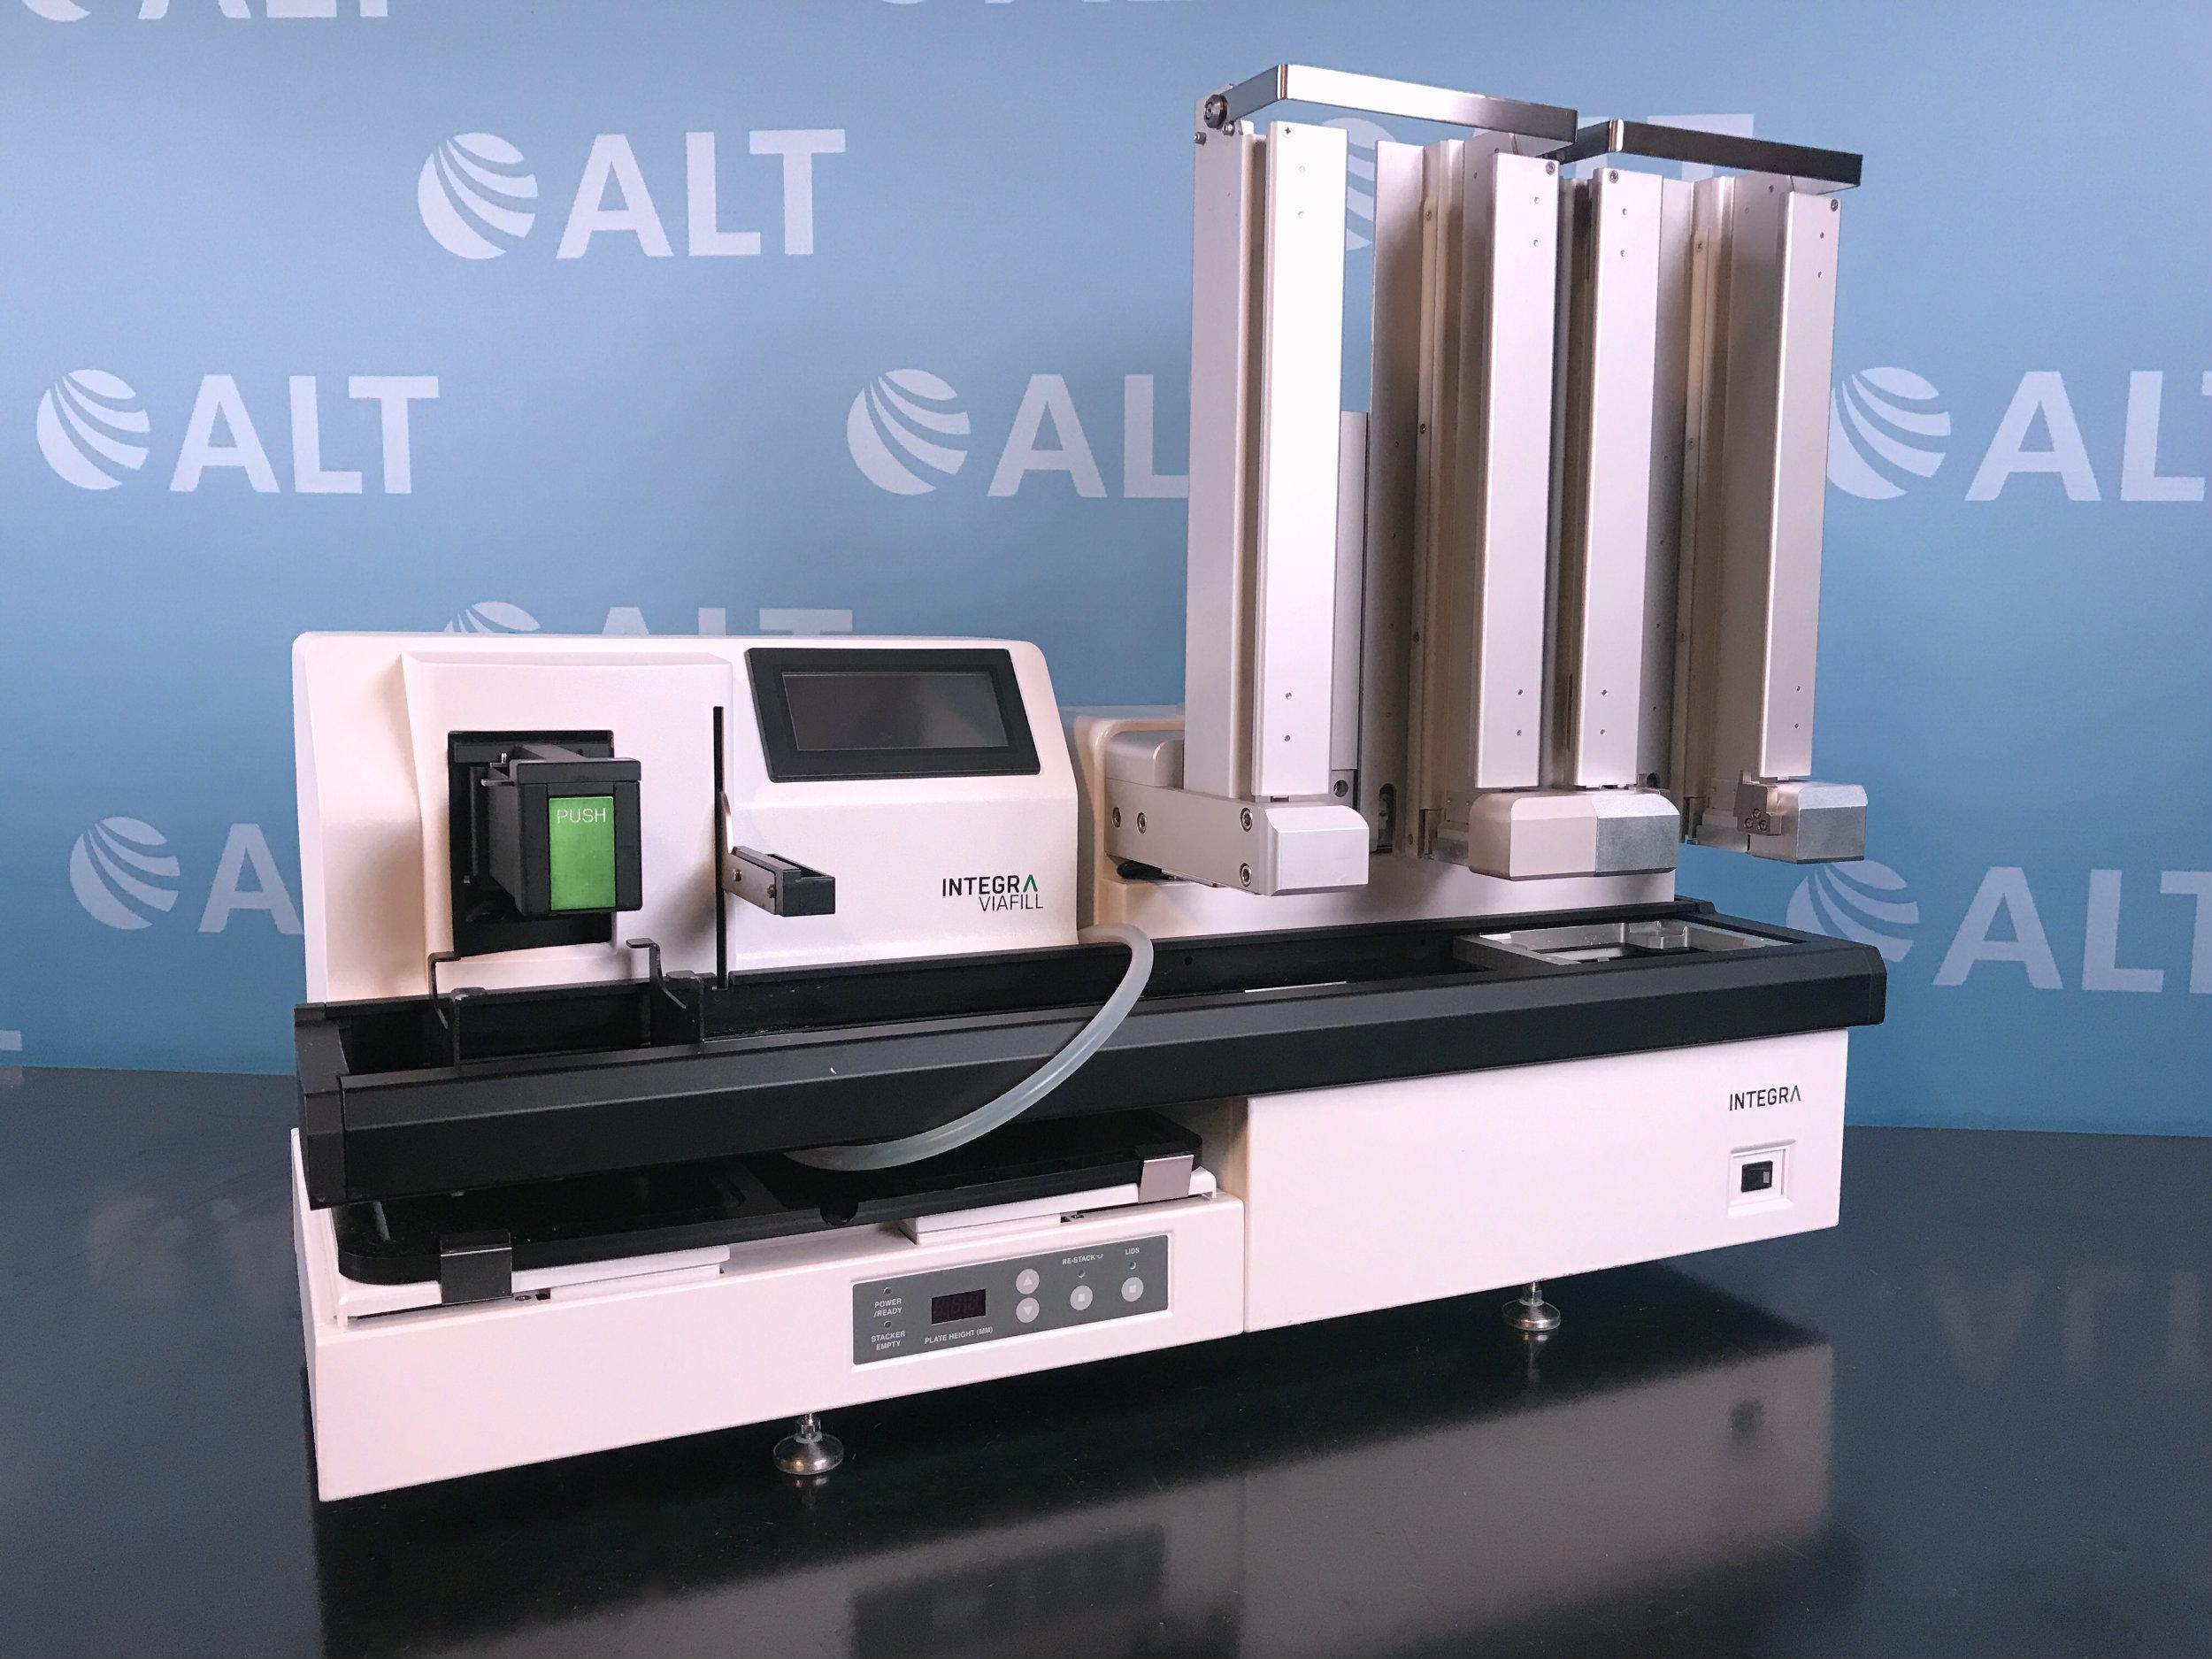 IBS Integra Biosciences Viafill Rapid Reagent Dispenser With Viafill Stacker Image